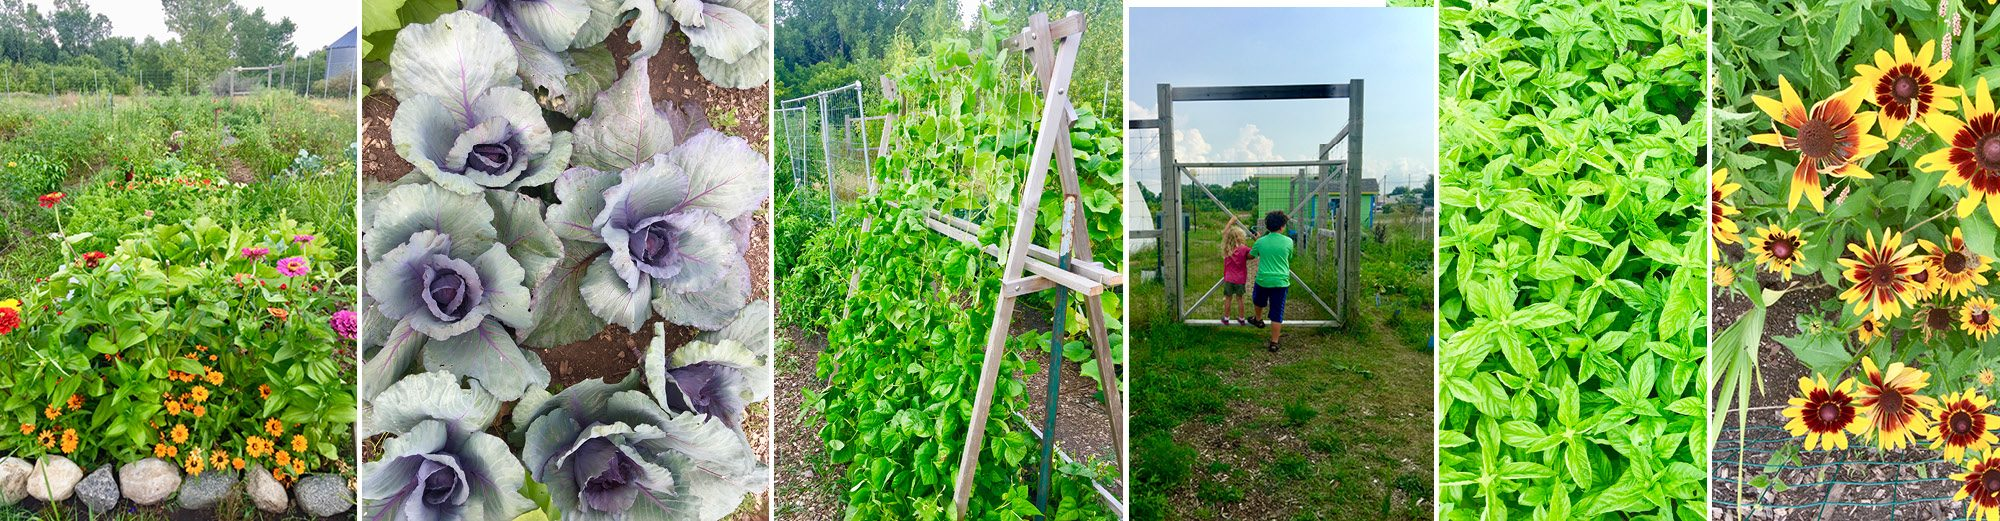 New Ulm Community Garden at Putting Green